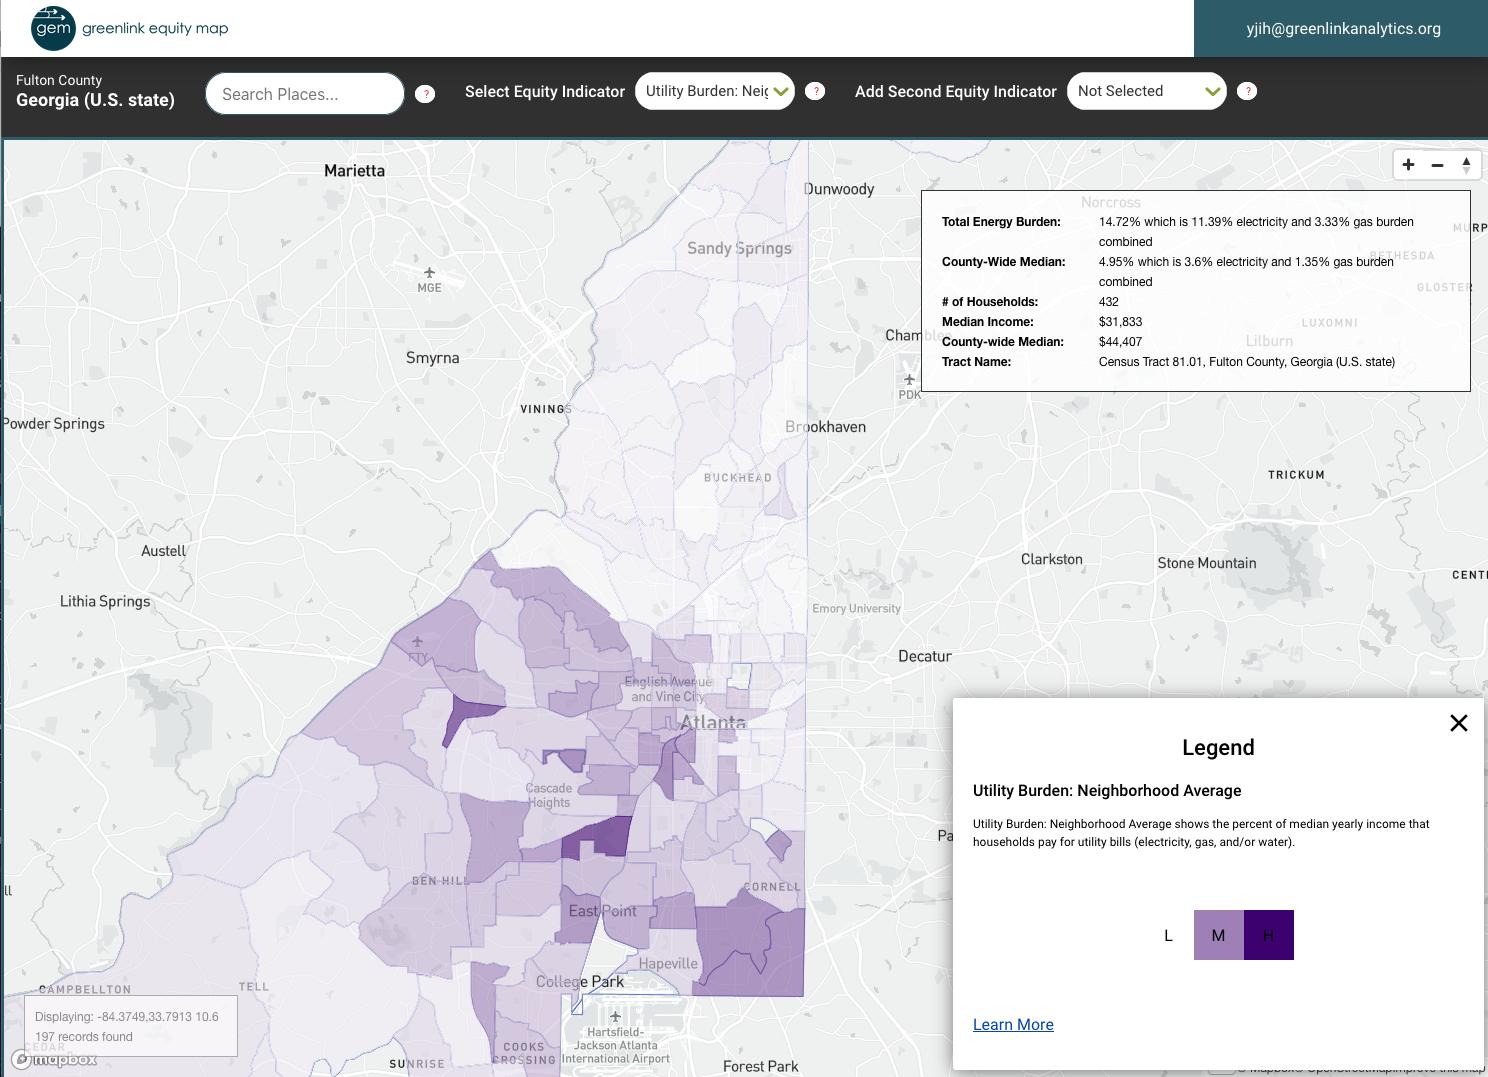 Energy burden across the City of Atlanta